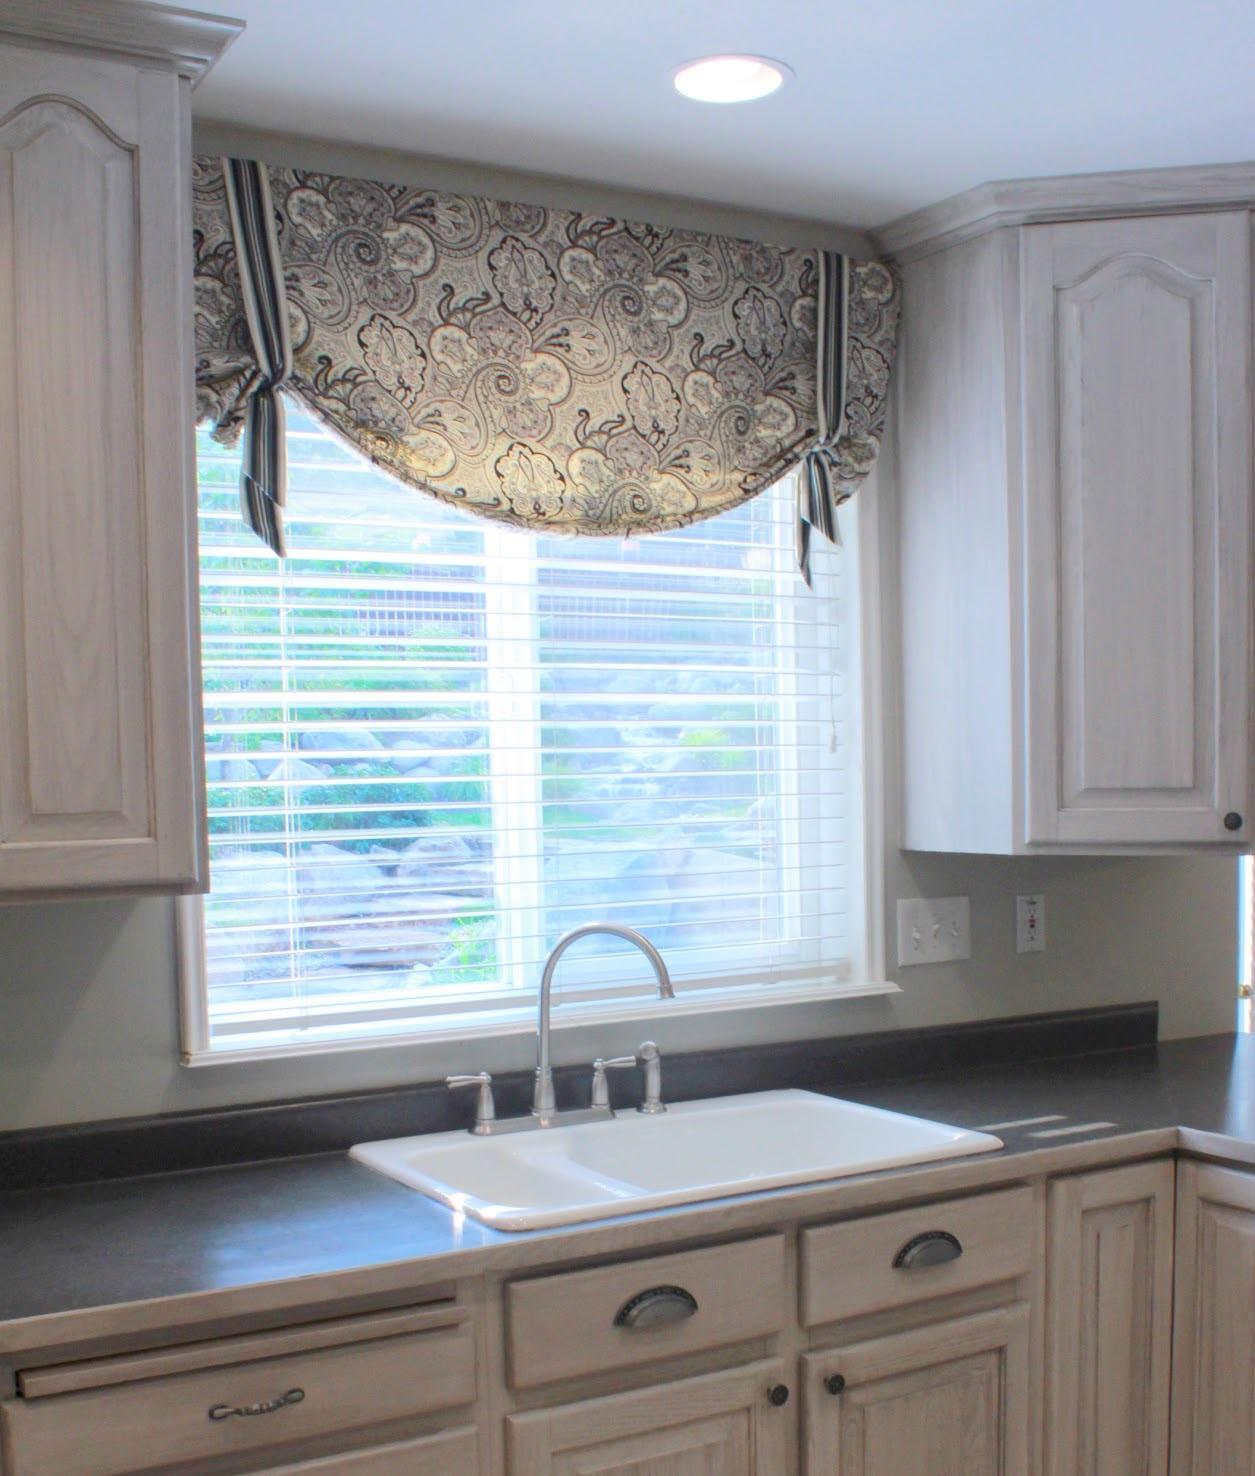 Kitchen Cabinet Cornice: Window Treatments Design Ideas